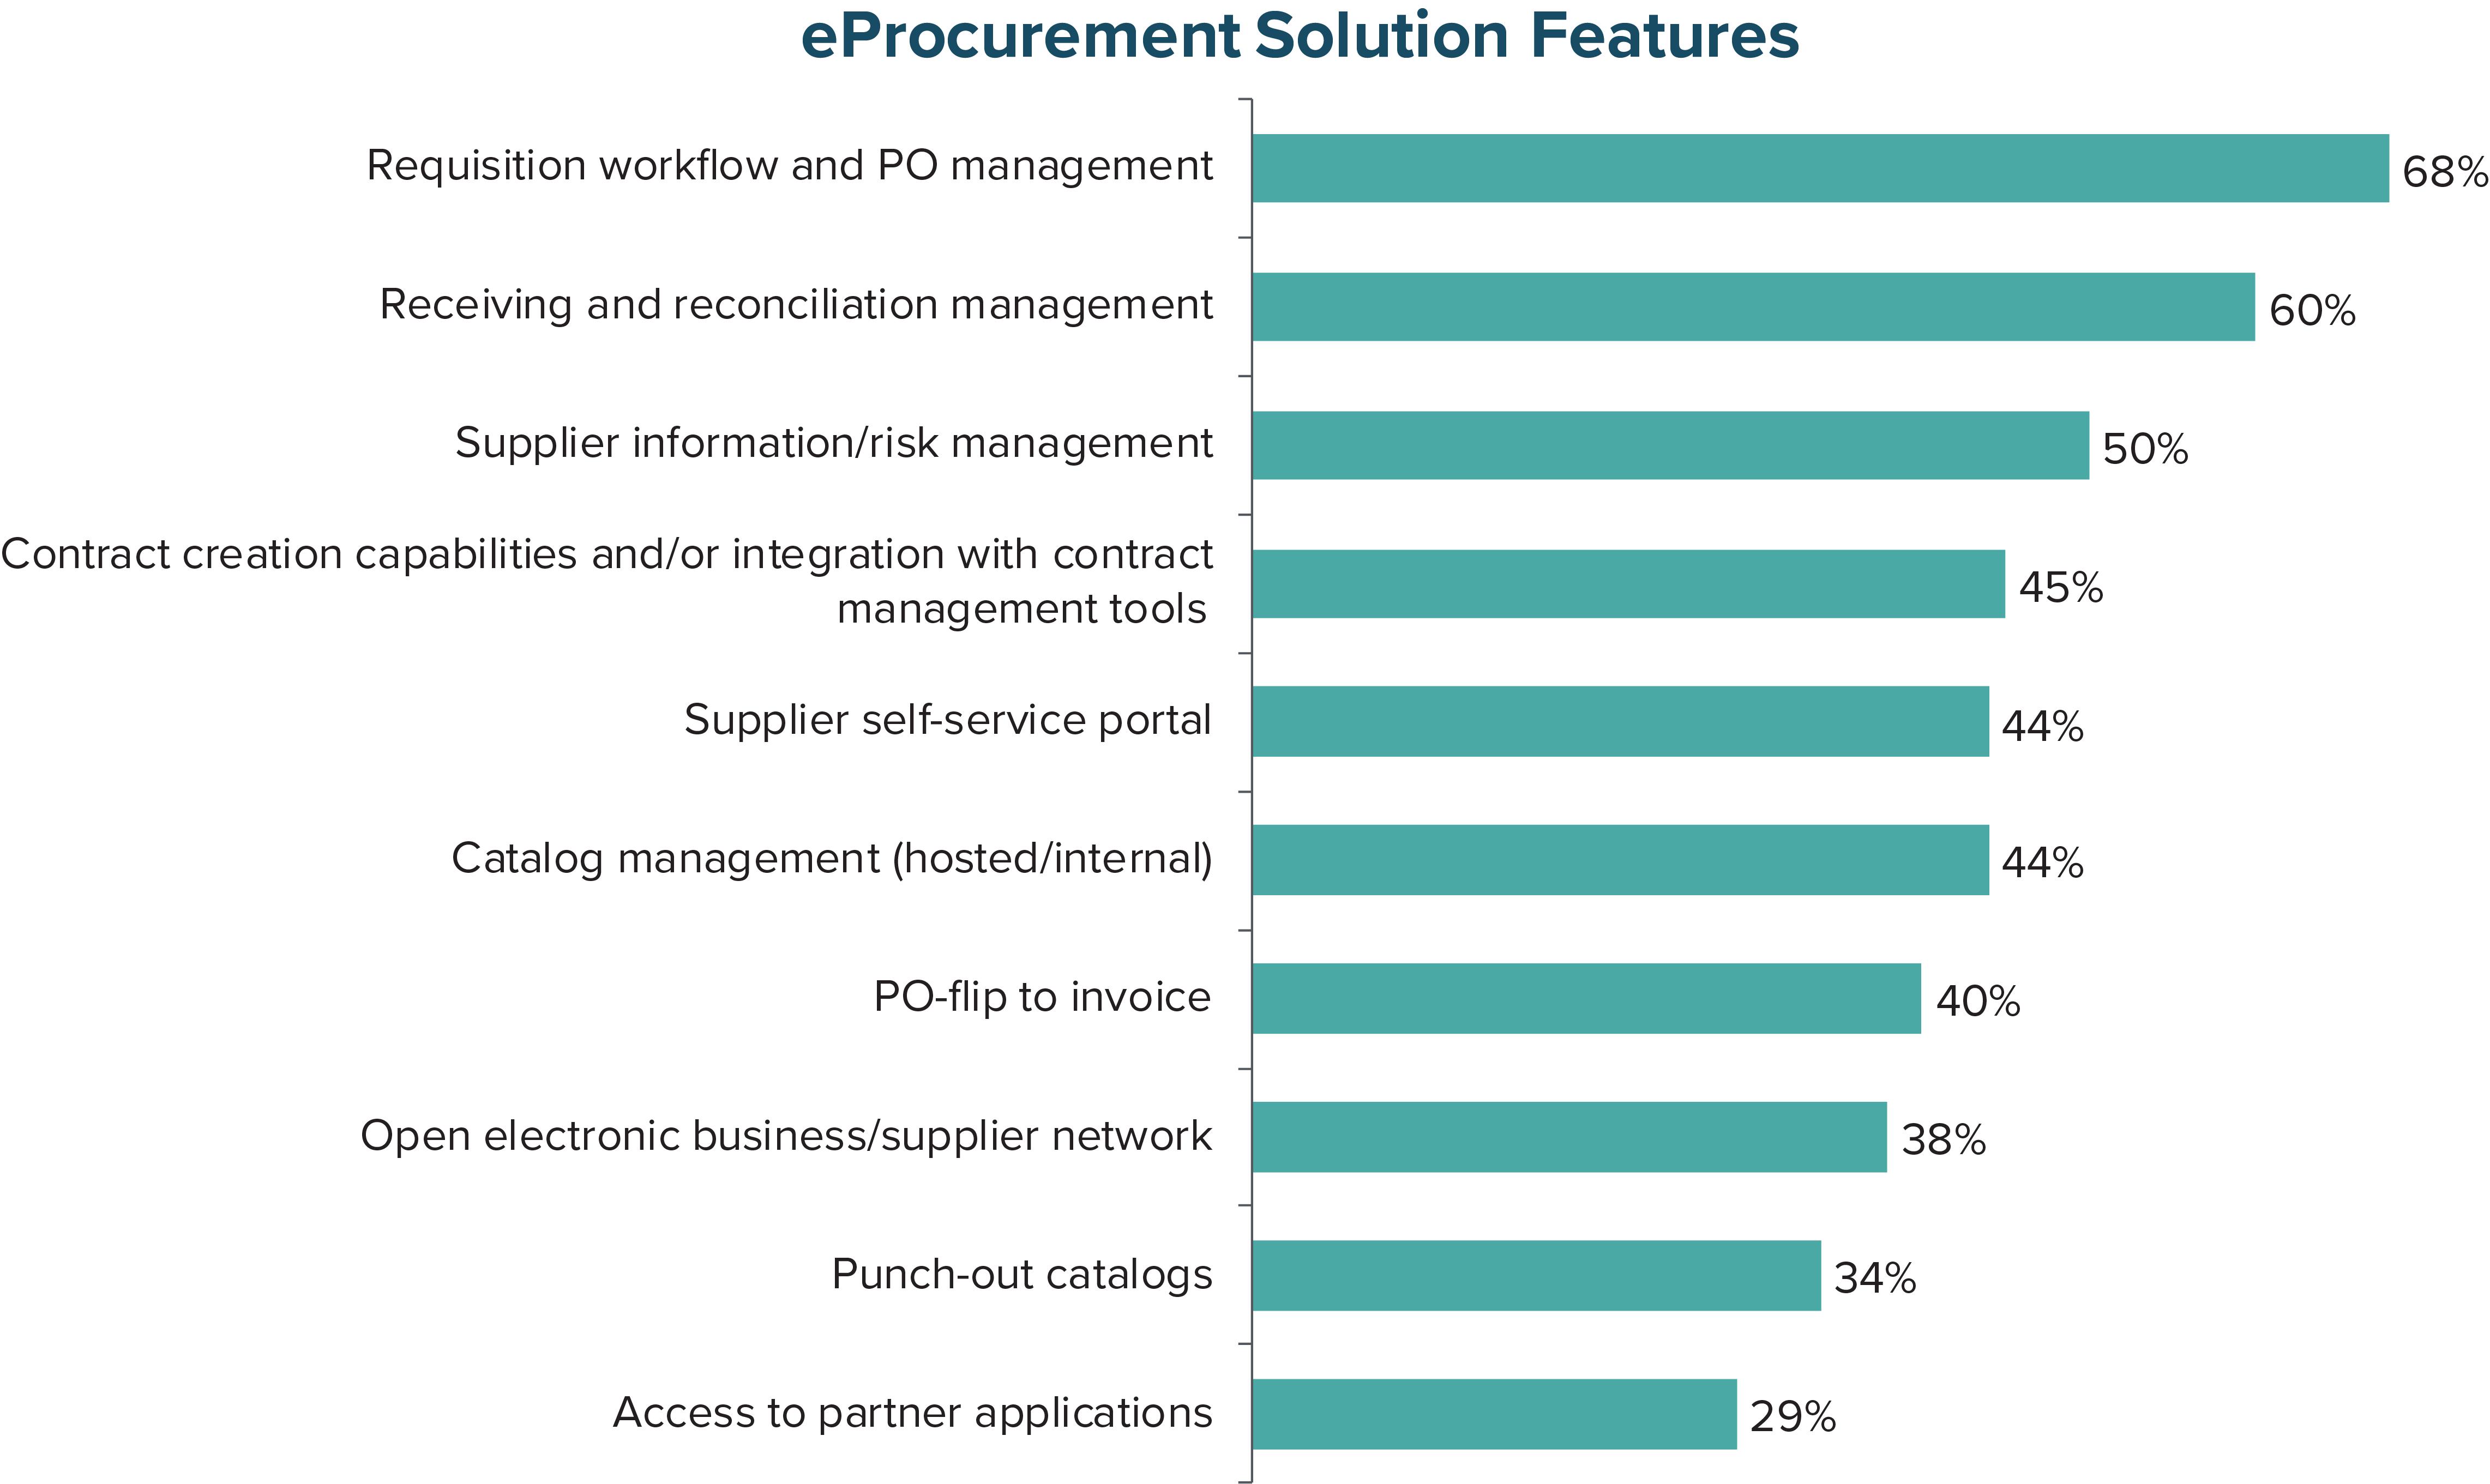 eProcurement Solution Features